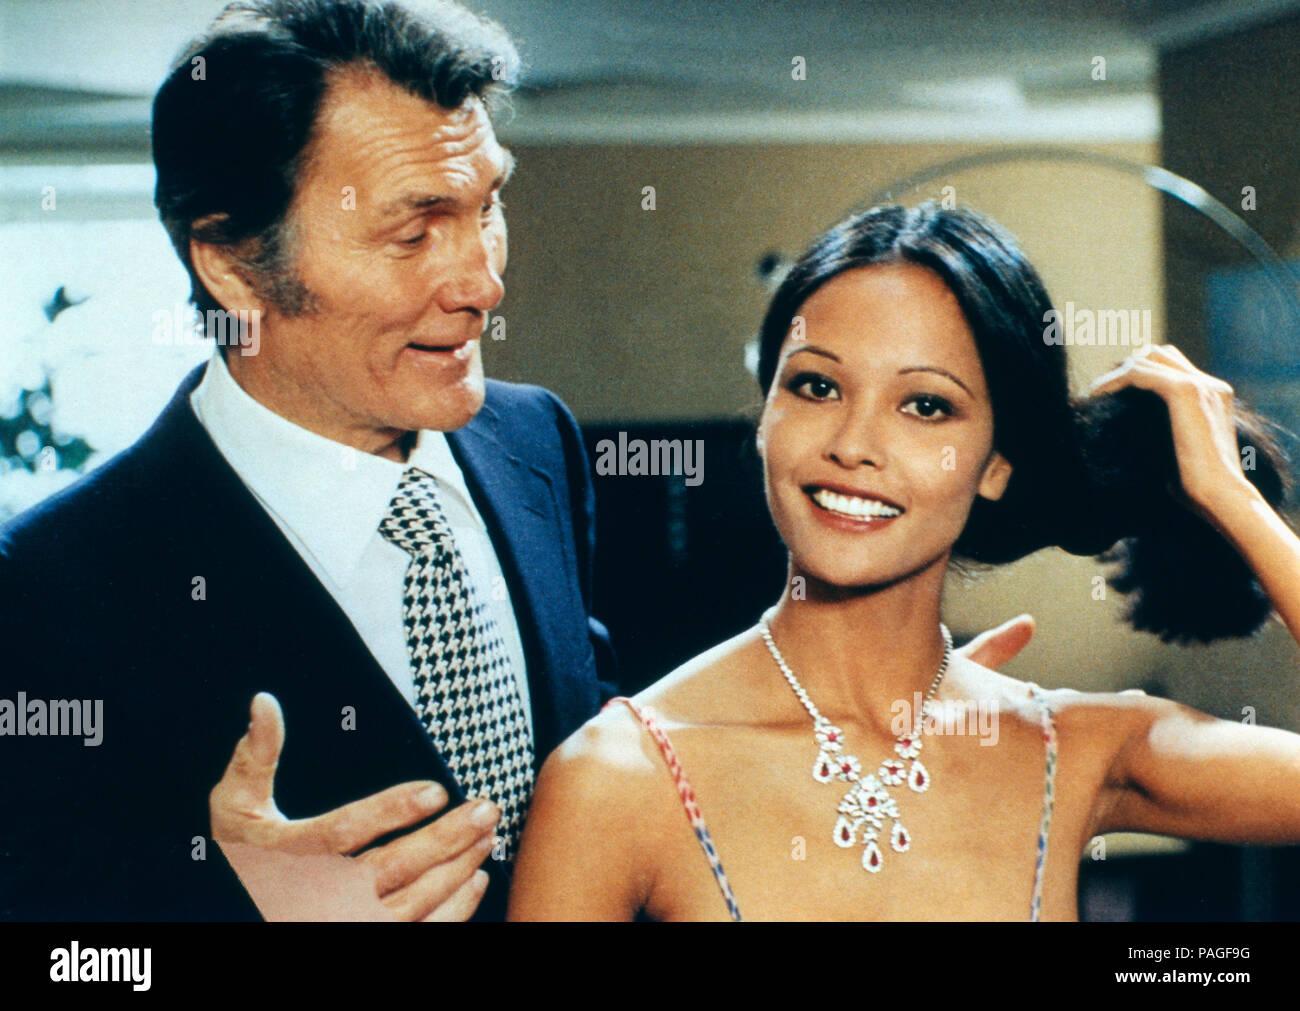 Eva Nera, alias: Nackte Eva, Italien 1976, Regie: Joe D'Amato, Darsteller: Jack Palance, Laura Gemser Stockbild